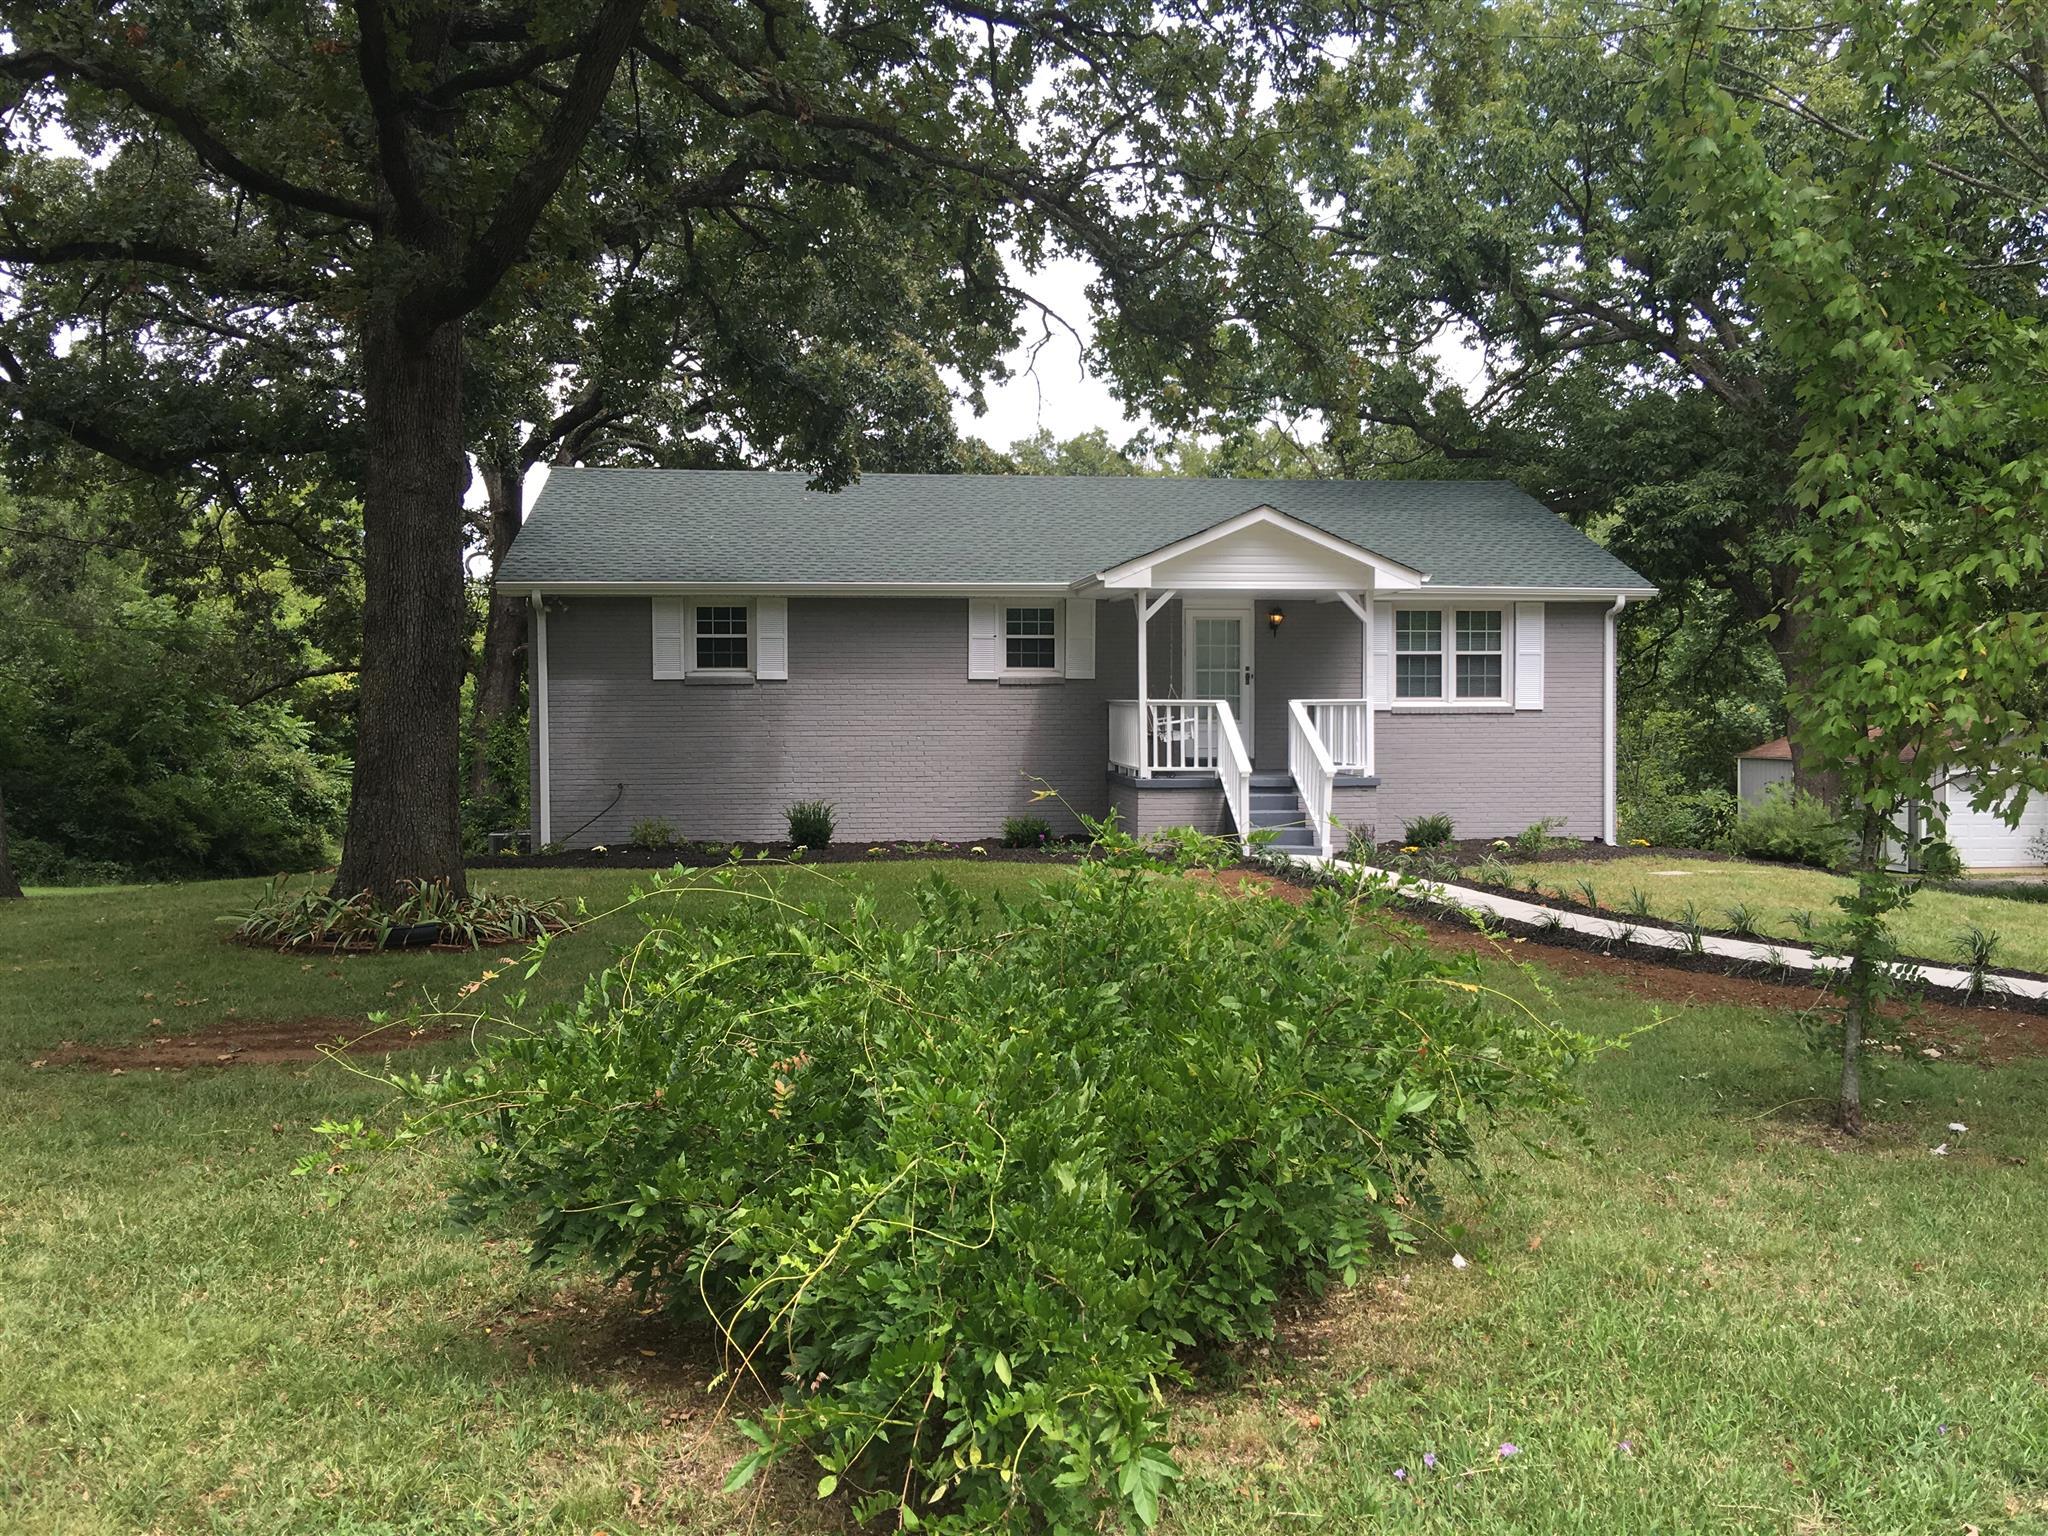 485 Old Nashville Hwy, La Vergne, TN 37086